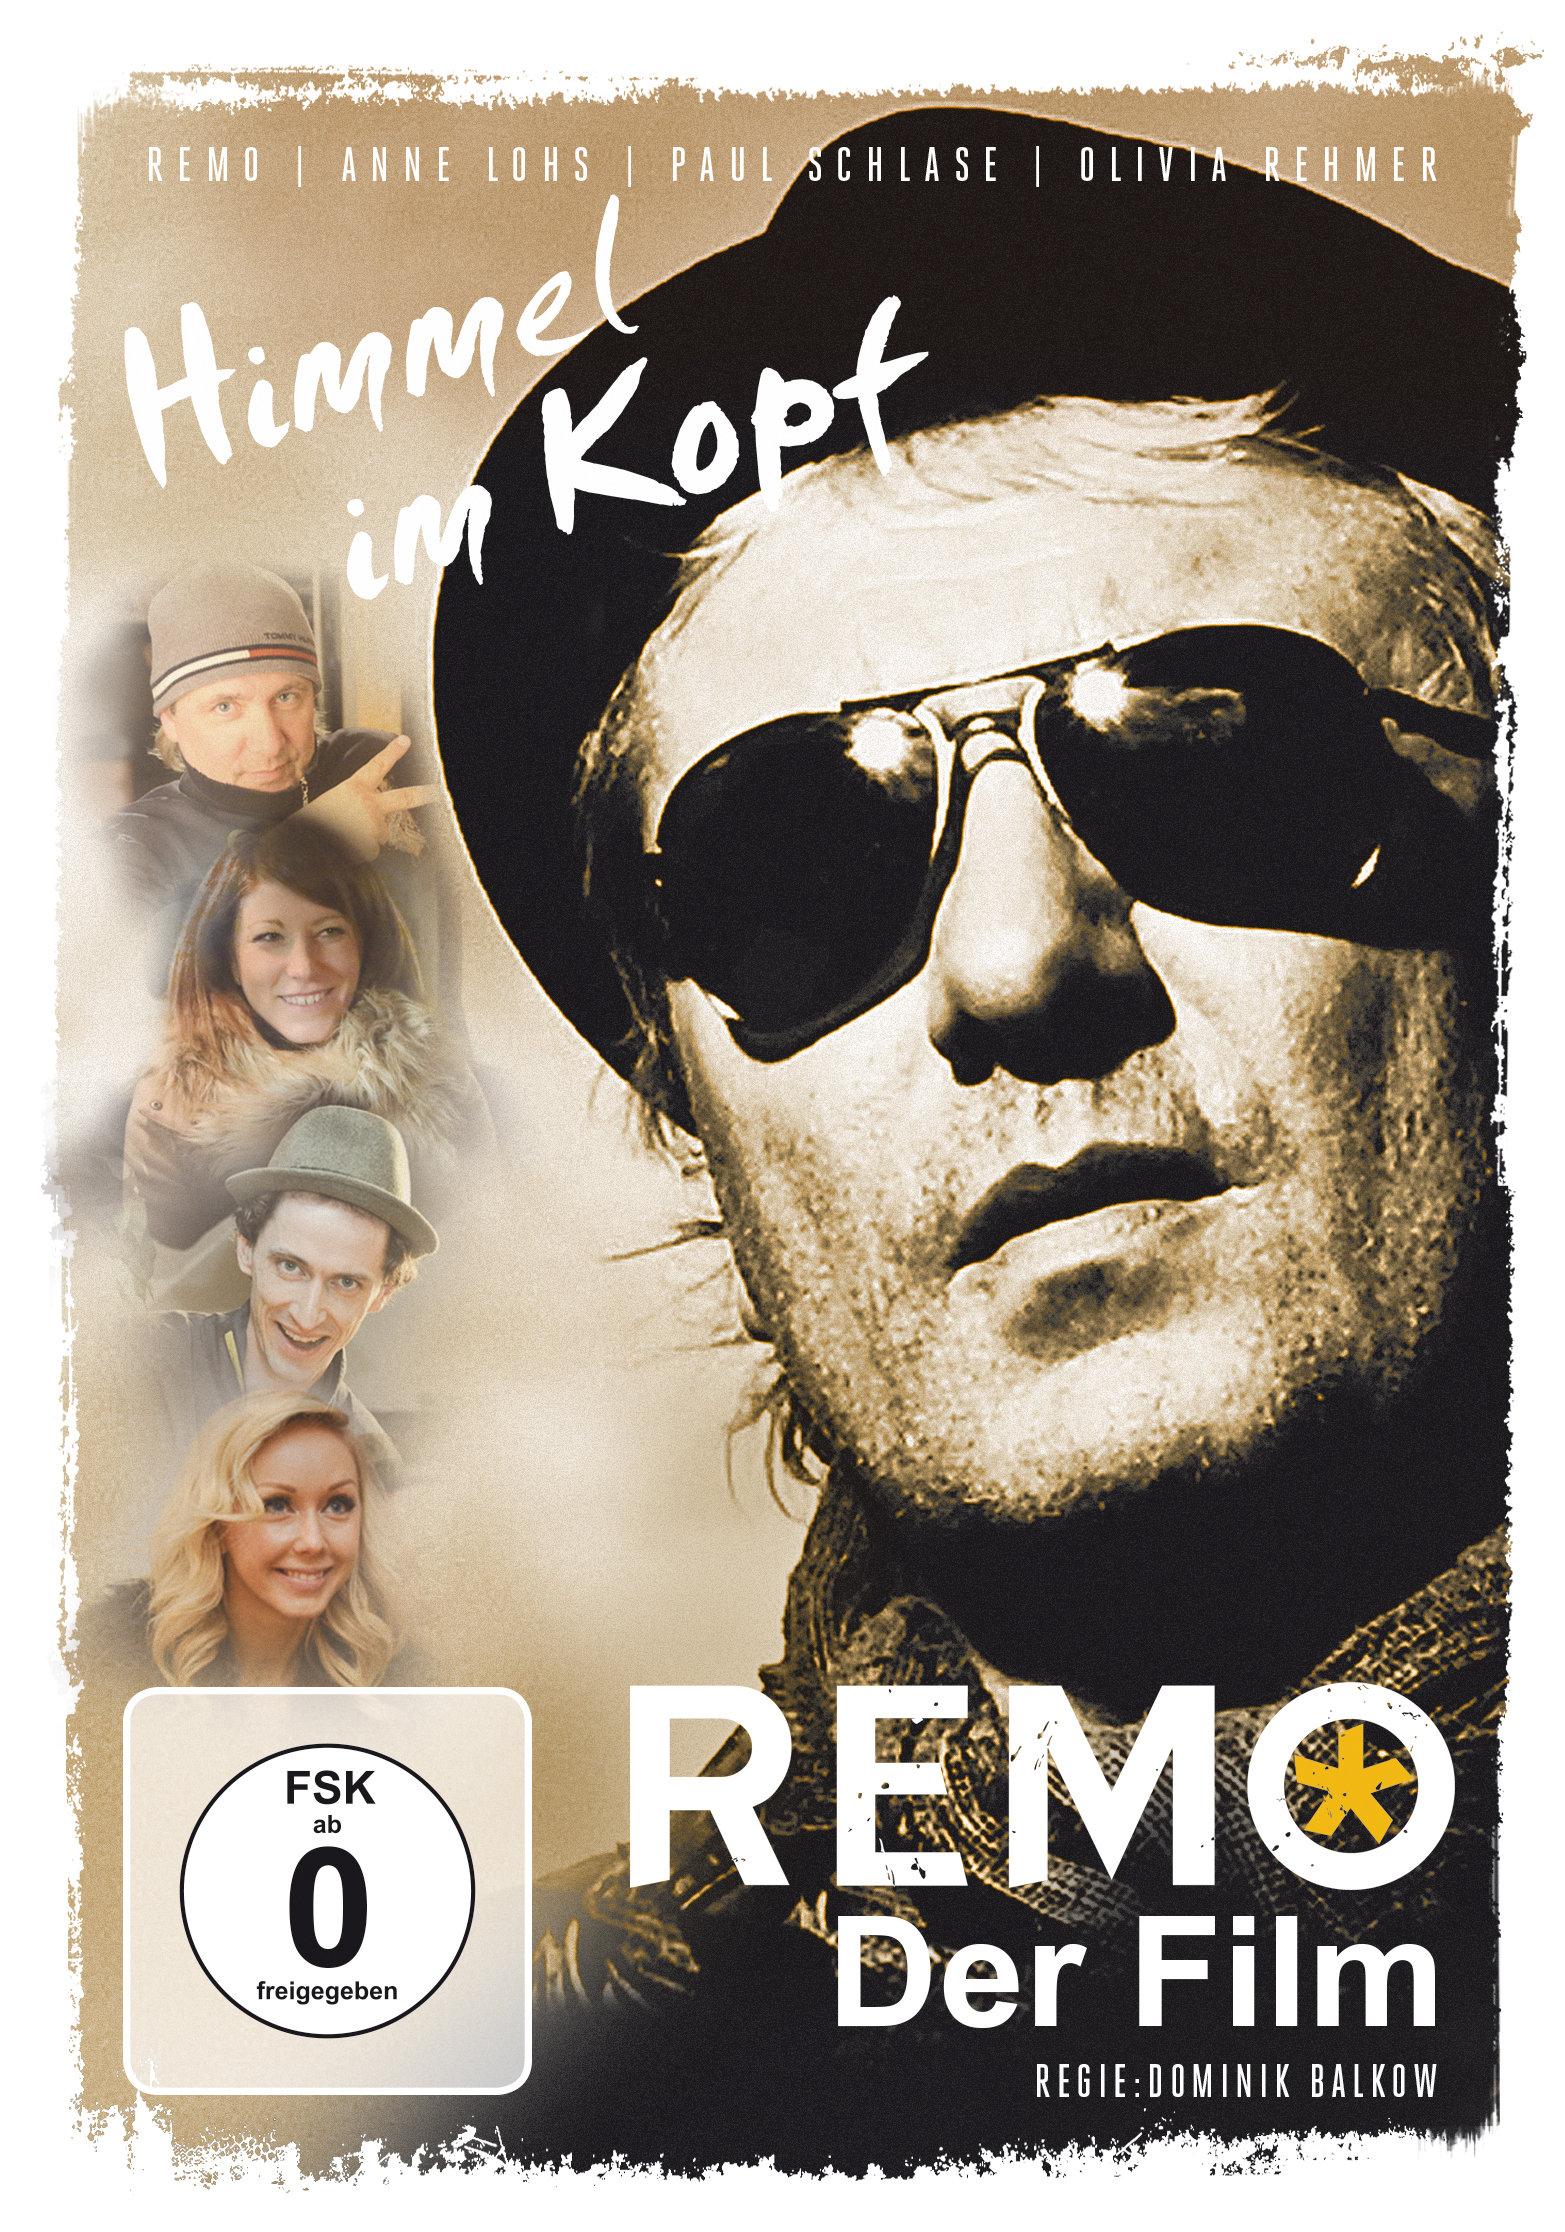 Himmel im Kopf - Remo: Der Film (Video 2014) - IMDb